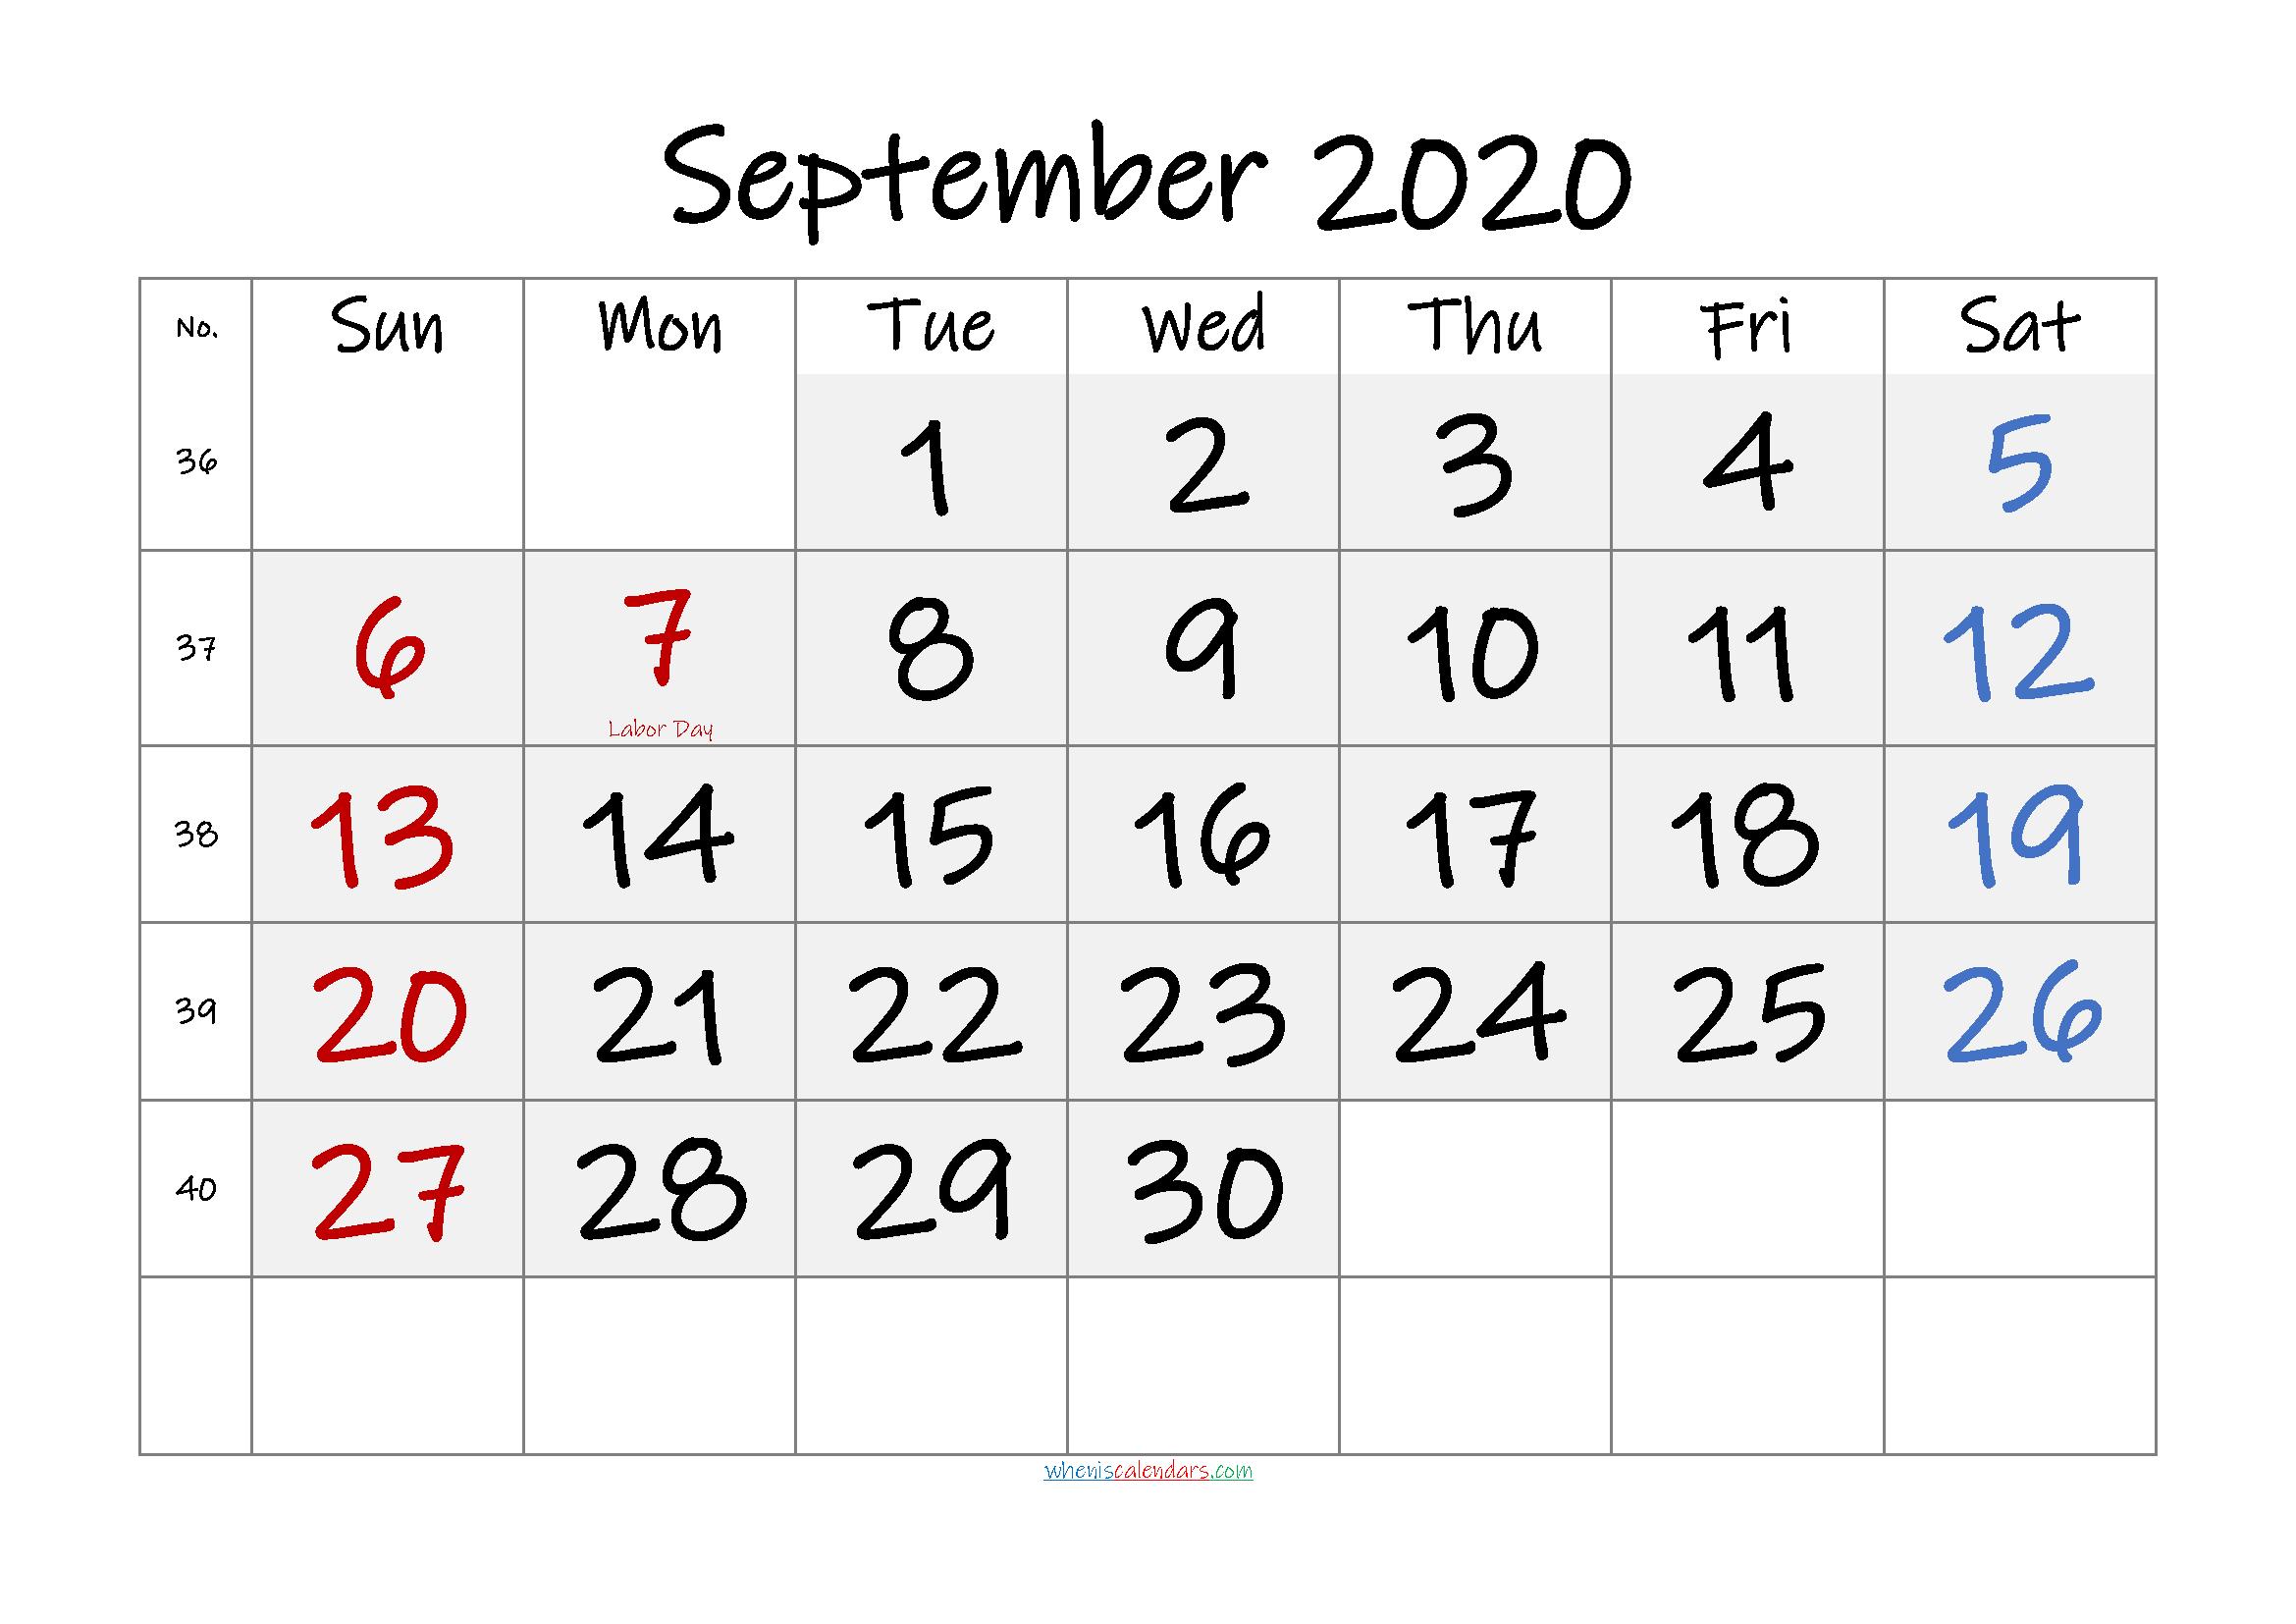 Free Printable September 2020 Calendar with Holidays